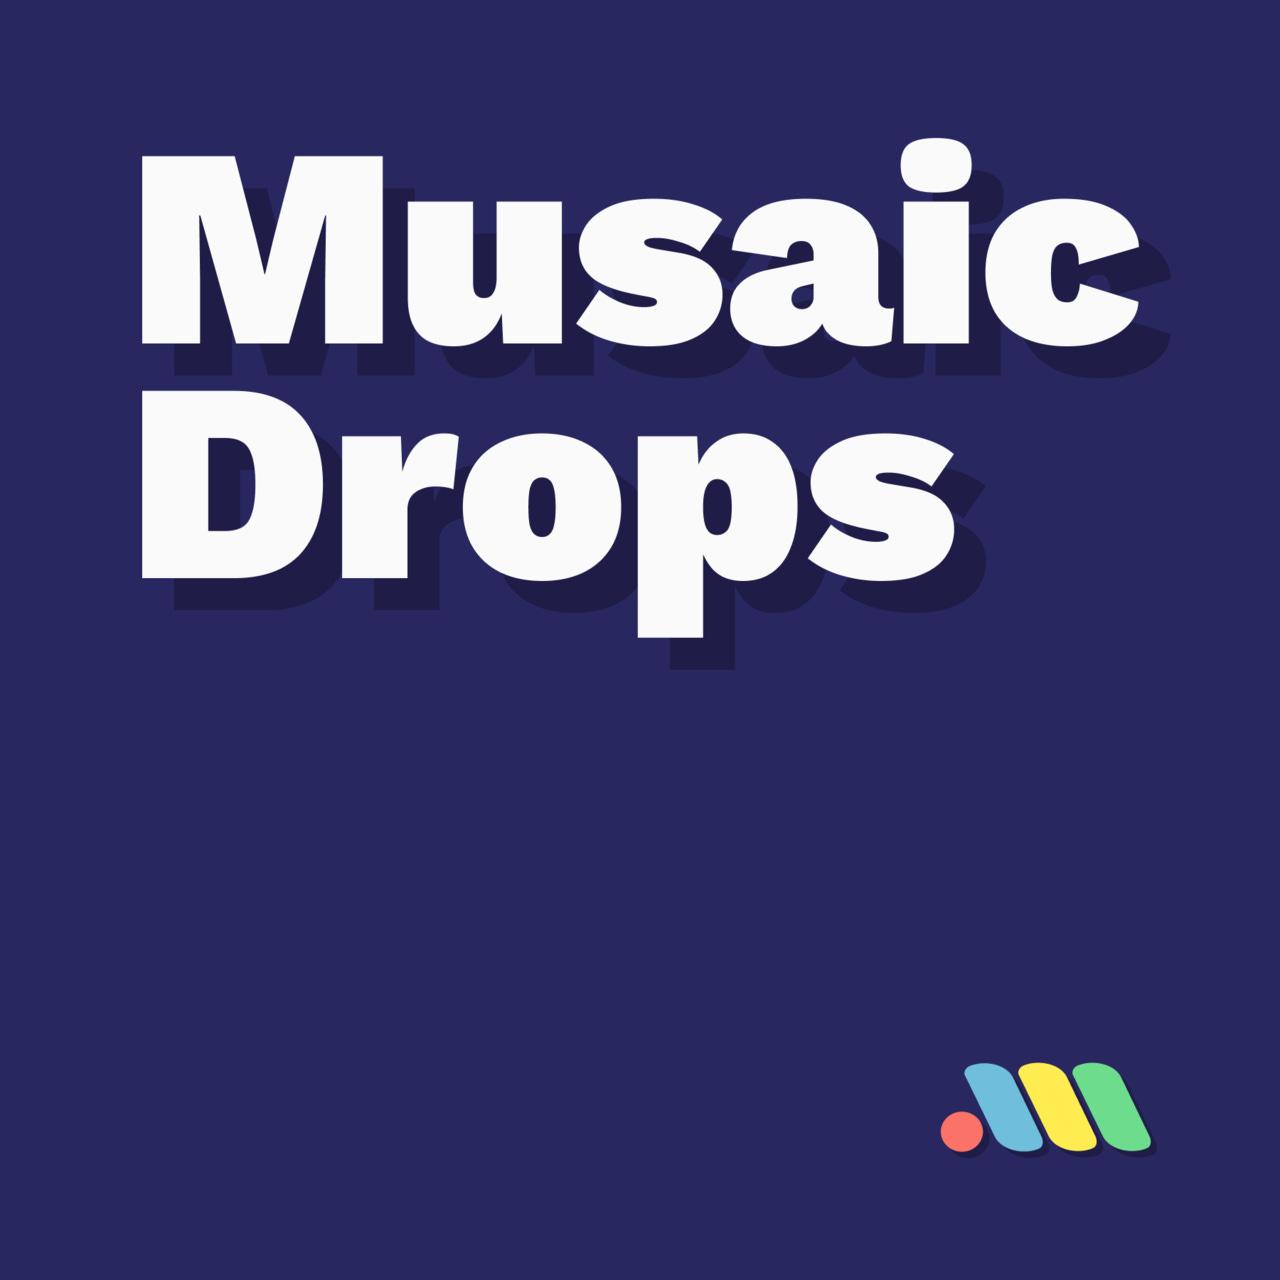 Musaic Drops